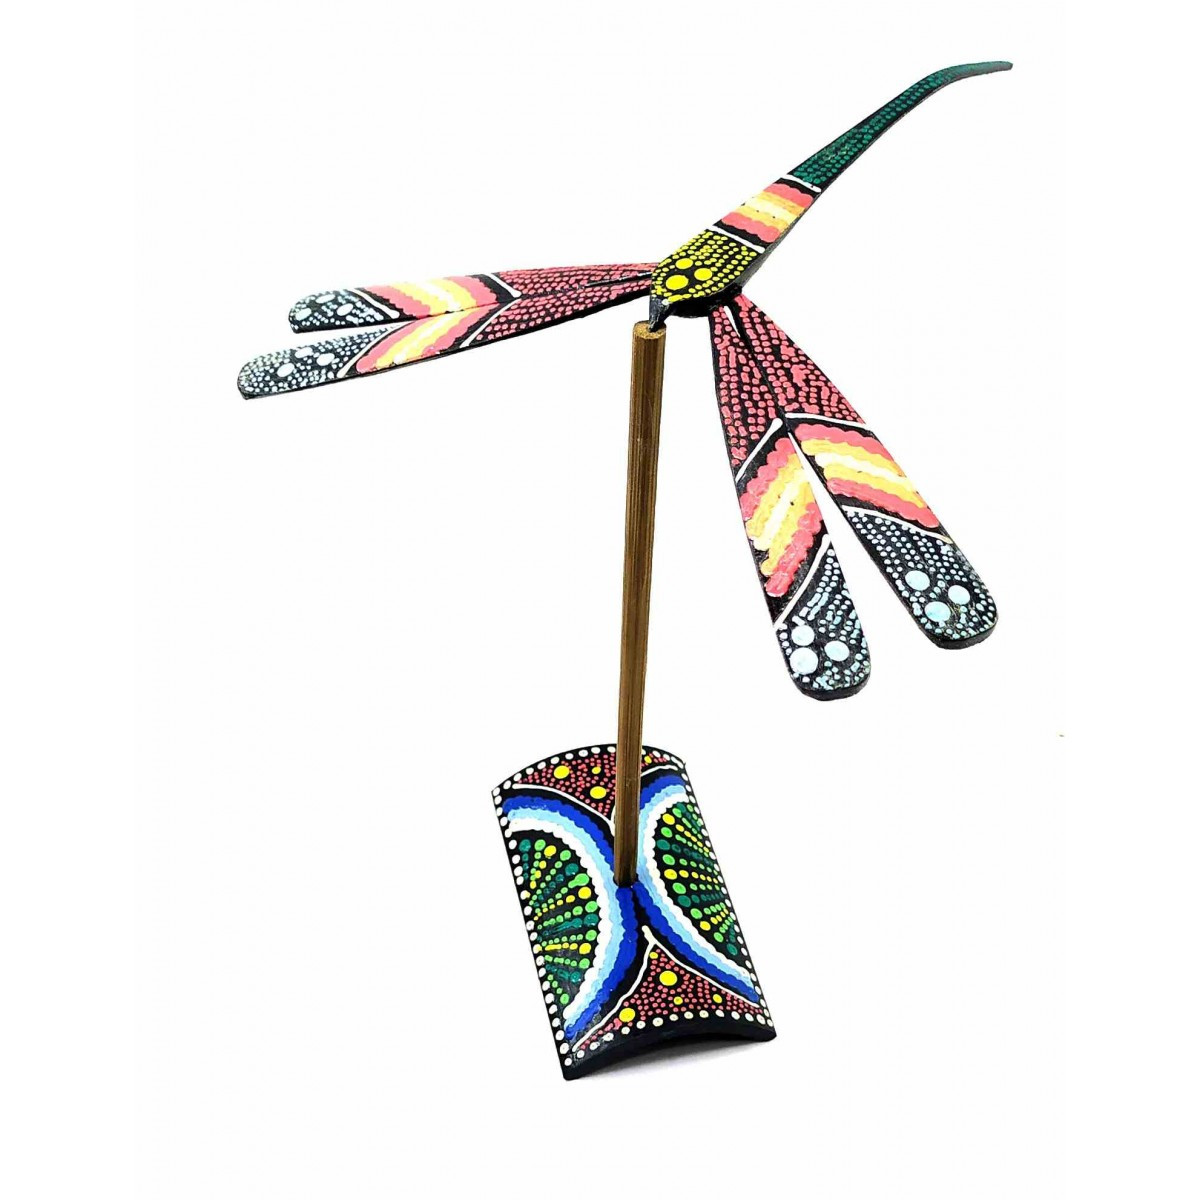 Статуэтка баланс бамбуковая Стрекоза